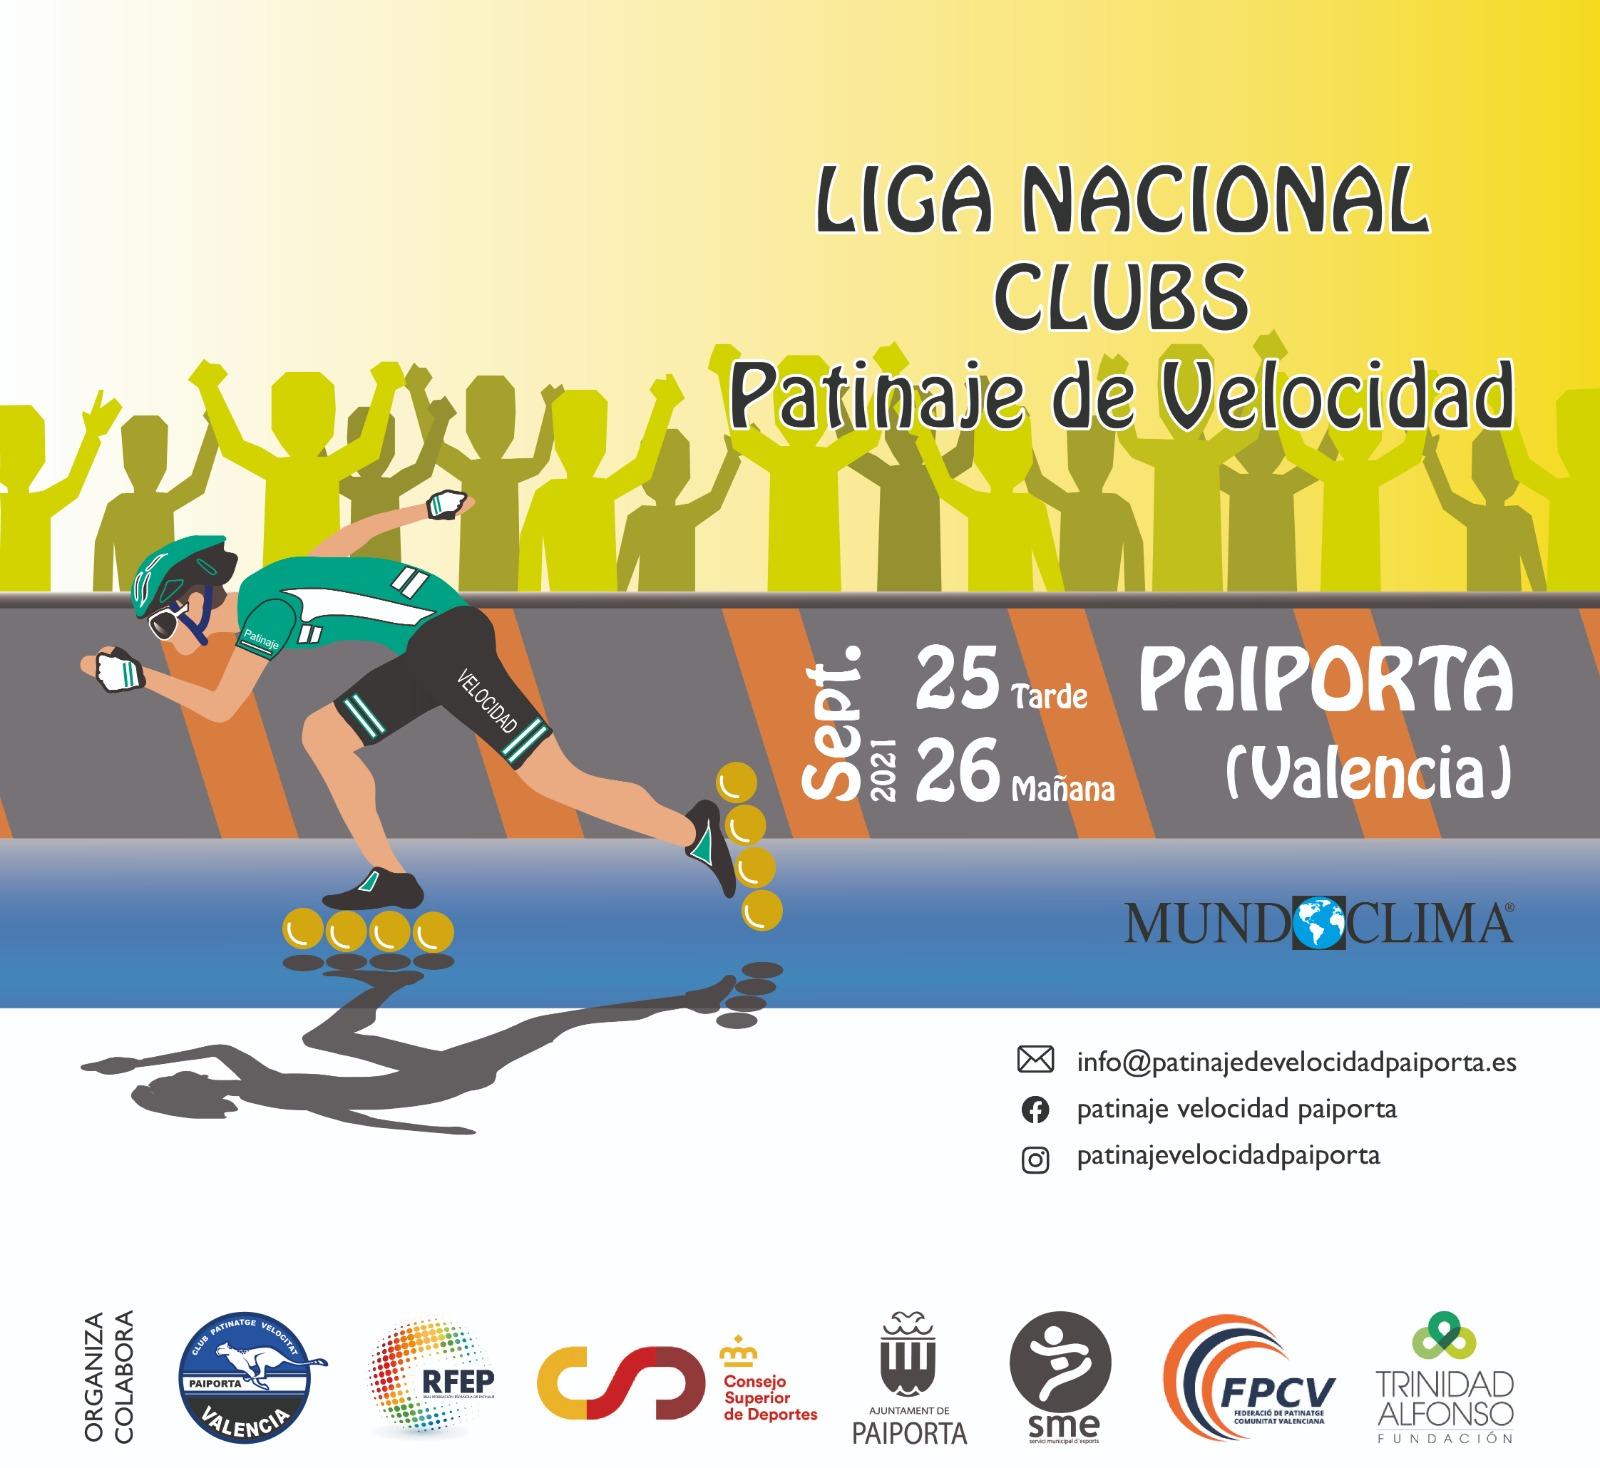 Cartel liga Nacional Clubs patinaje de velocidad Paiporta